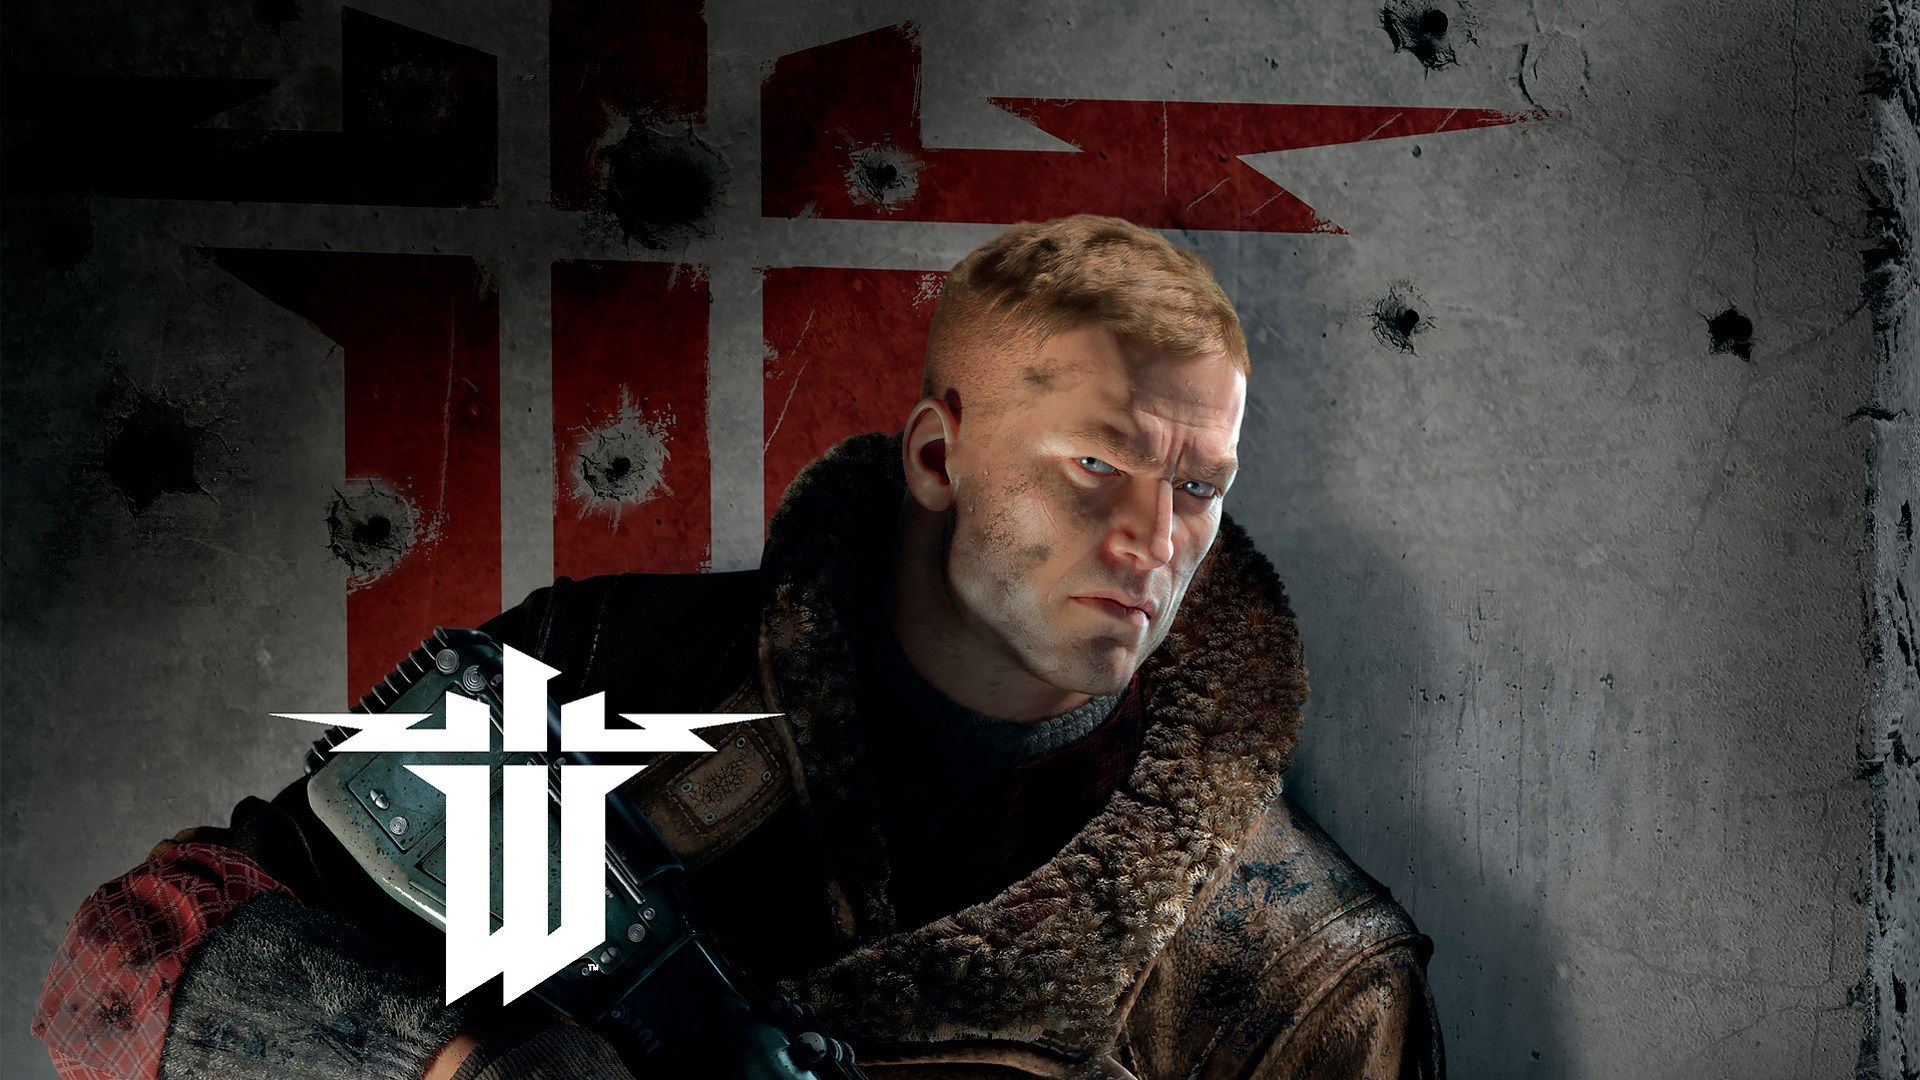 Жестокая расправа над нацистами втрейлере Wolfenstein 2: The New Colossus